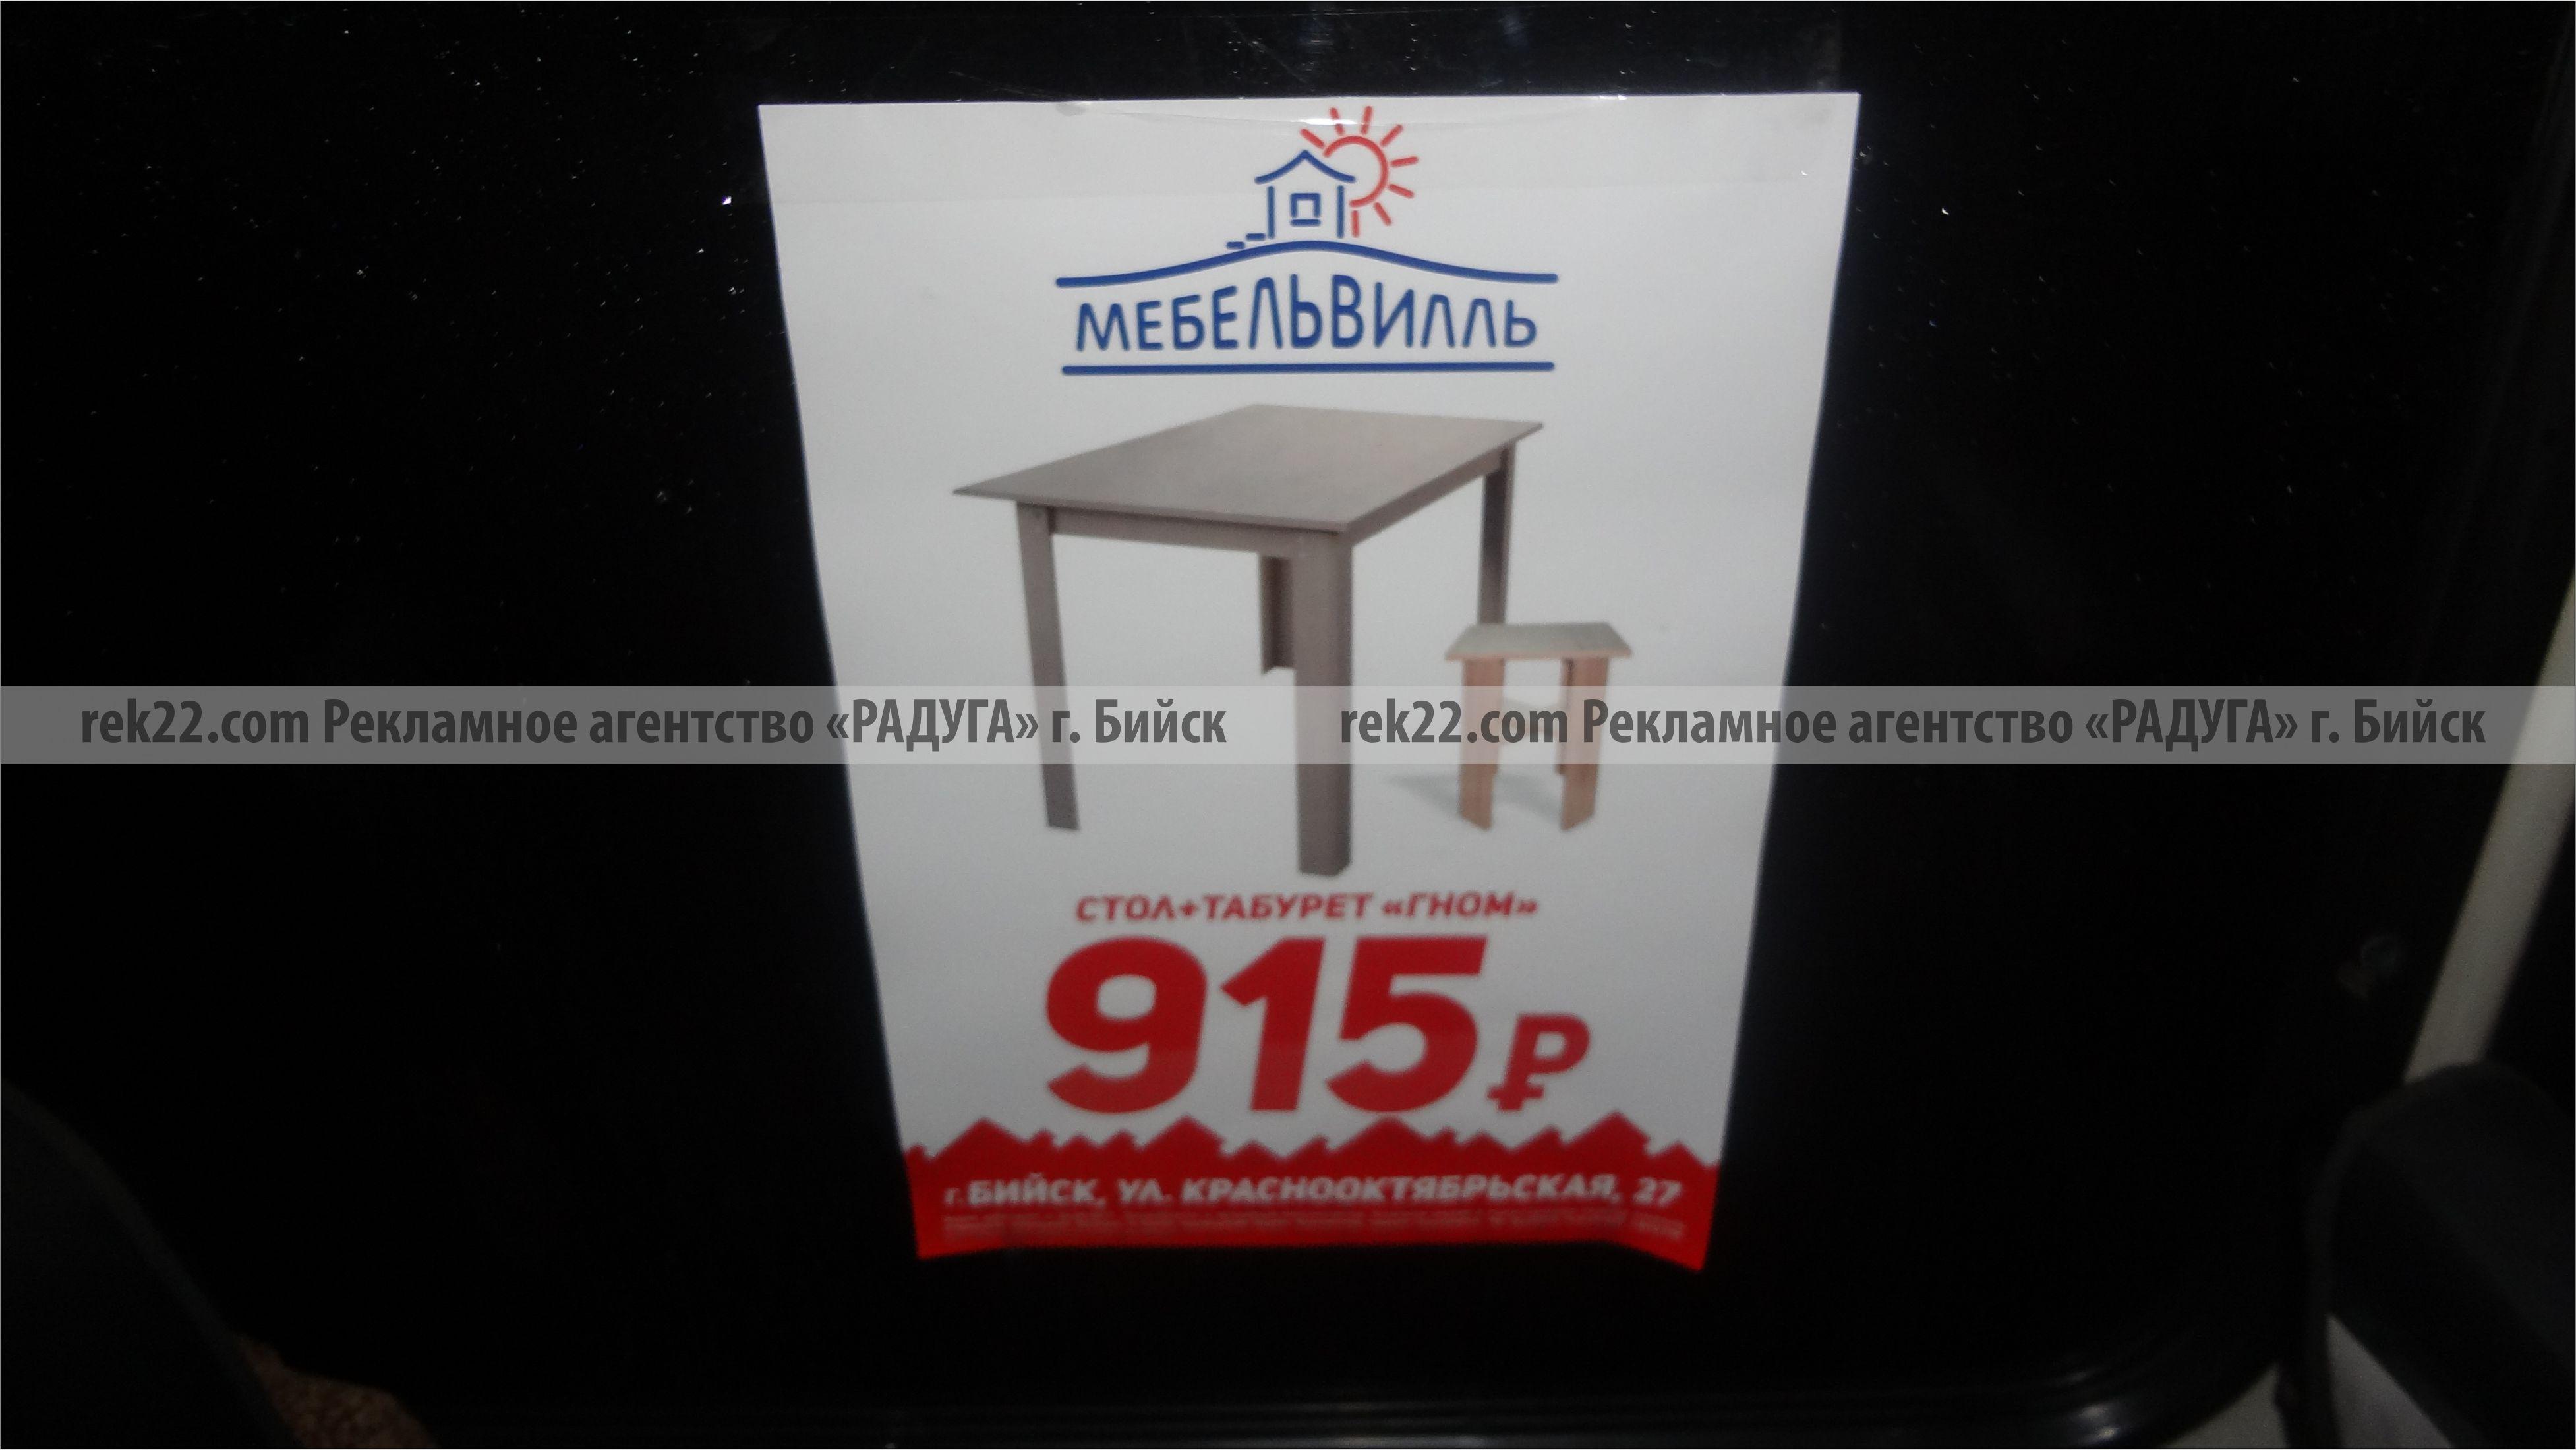 Реклама на транспорте Бийск - листовки - 2